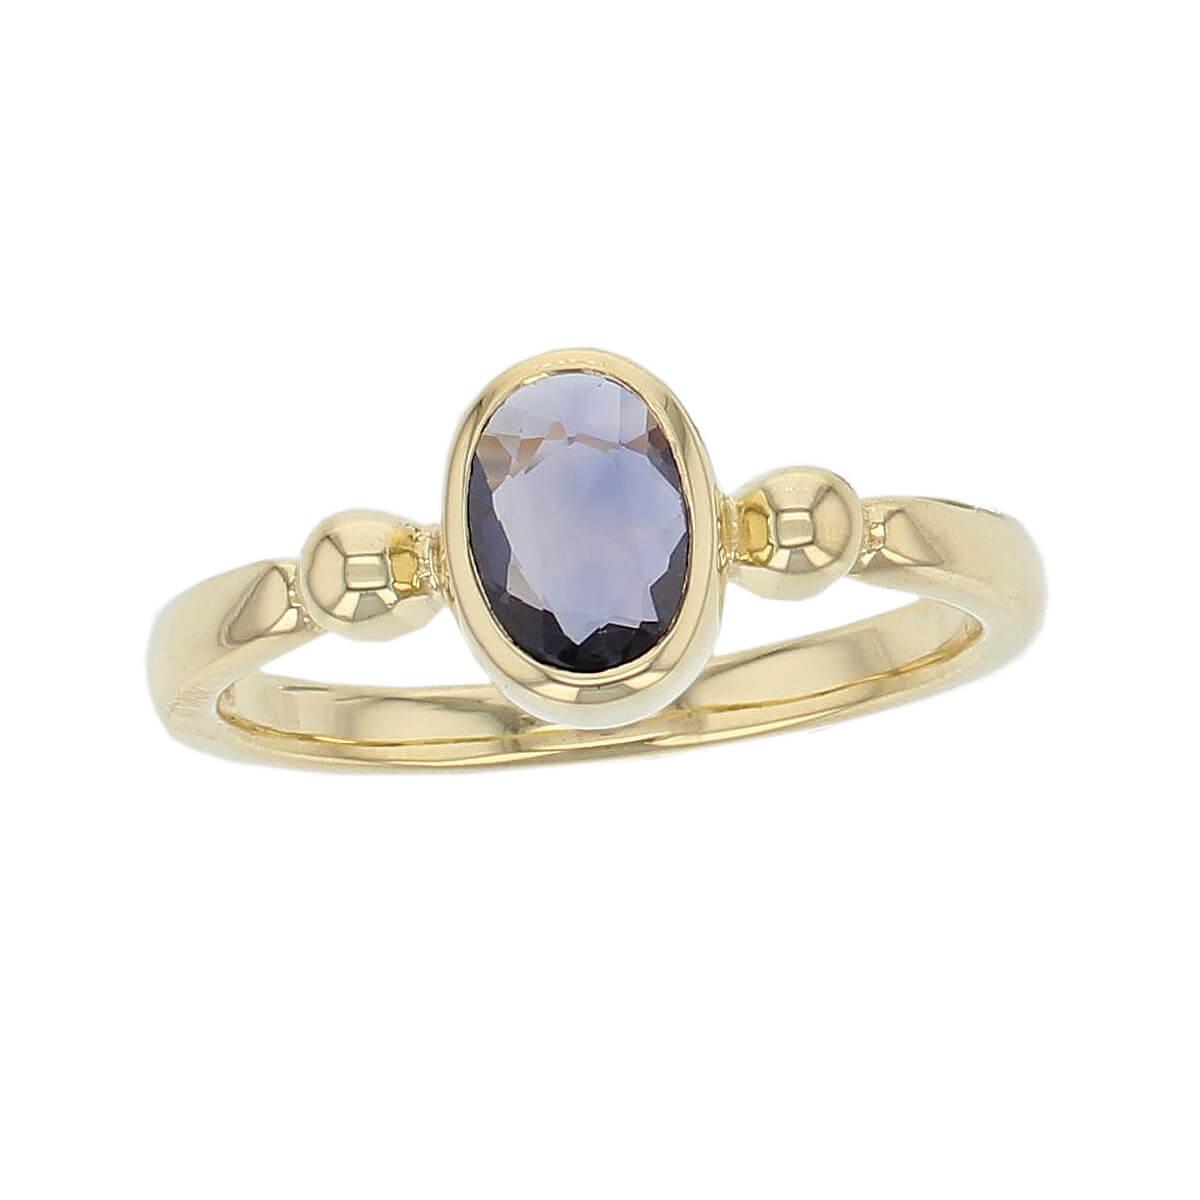 Kandy 18ct yellow gold pale purple oval rose cut sapphire gemstone ladies dress ring, designer jewellery, gem, jewelry, handmade by Faller, Londonderry, Northern Ireland, Irish hand crafted